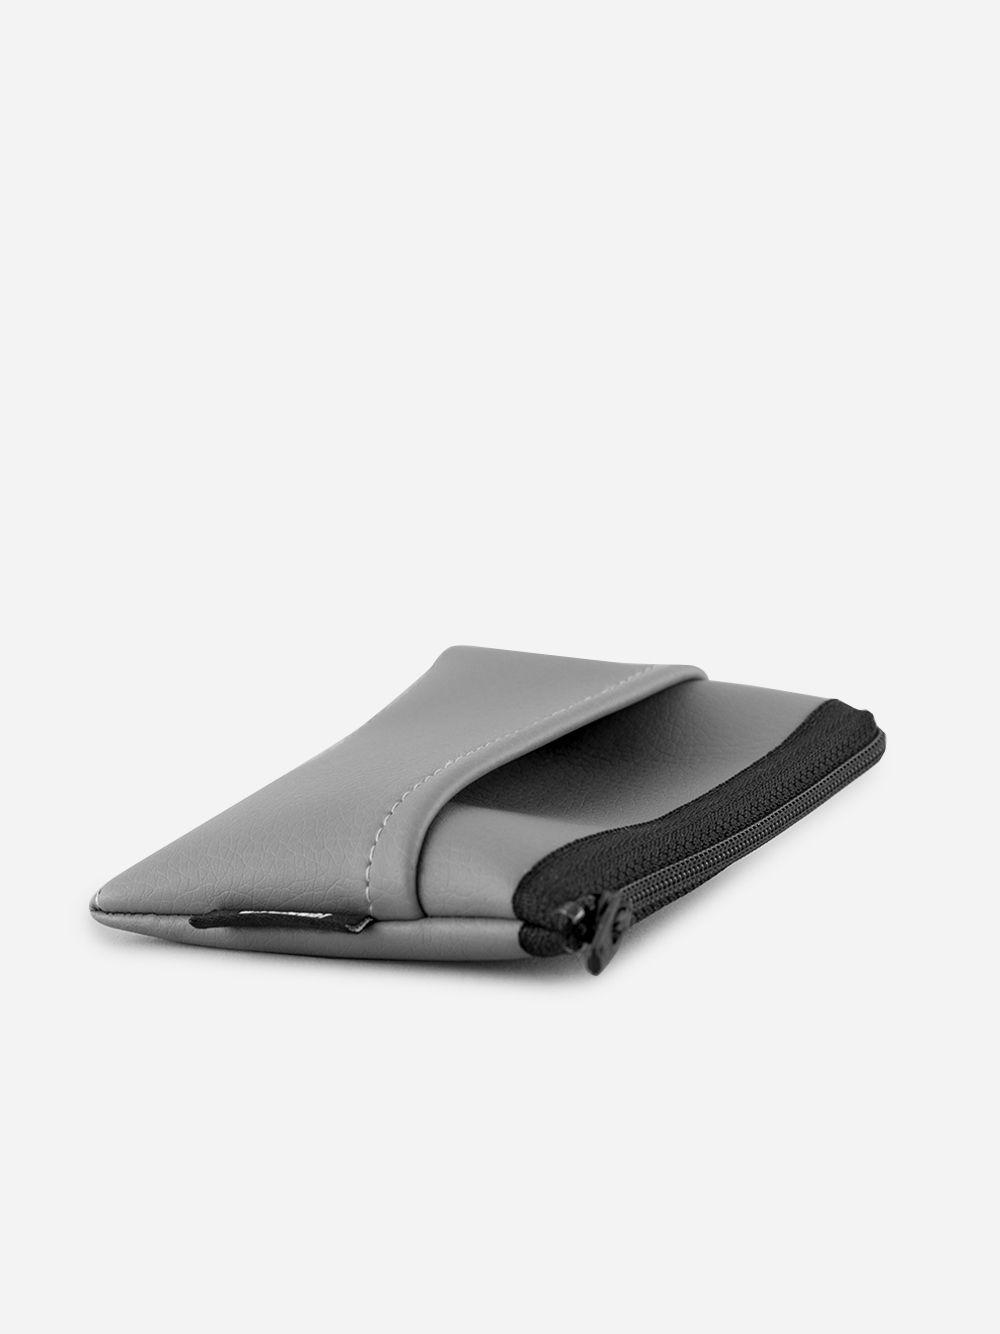 Porta Cartões Cinza | Wetheknot